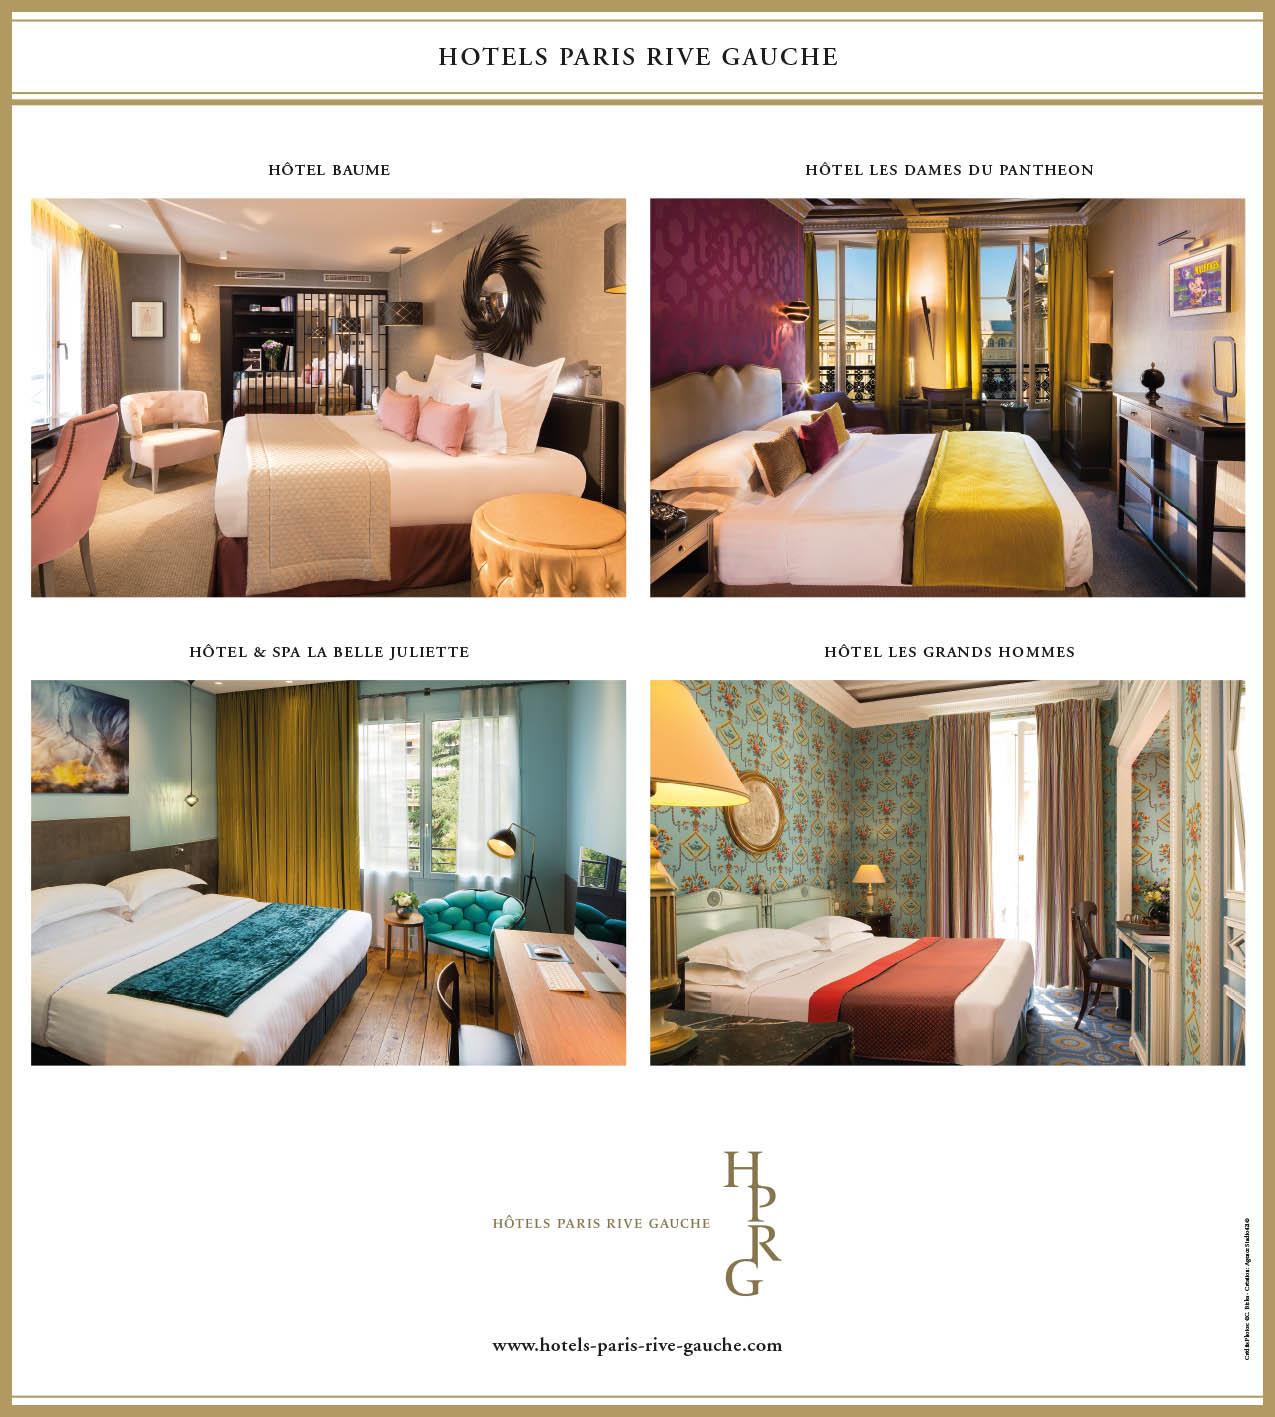 Affiche HOTEL PARIS RIVE GAUCHE